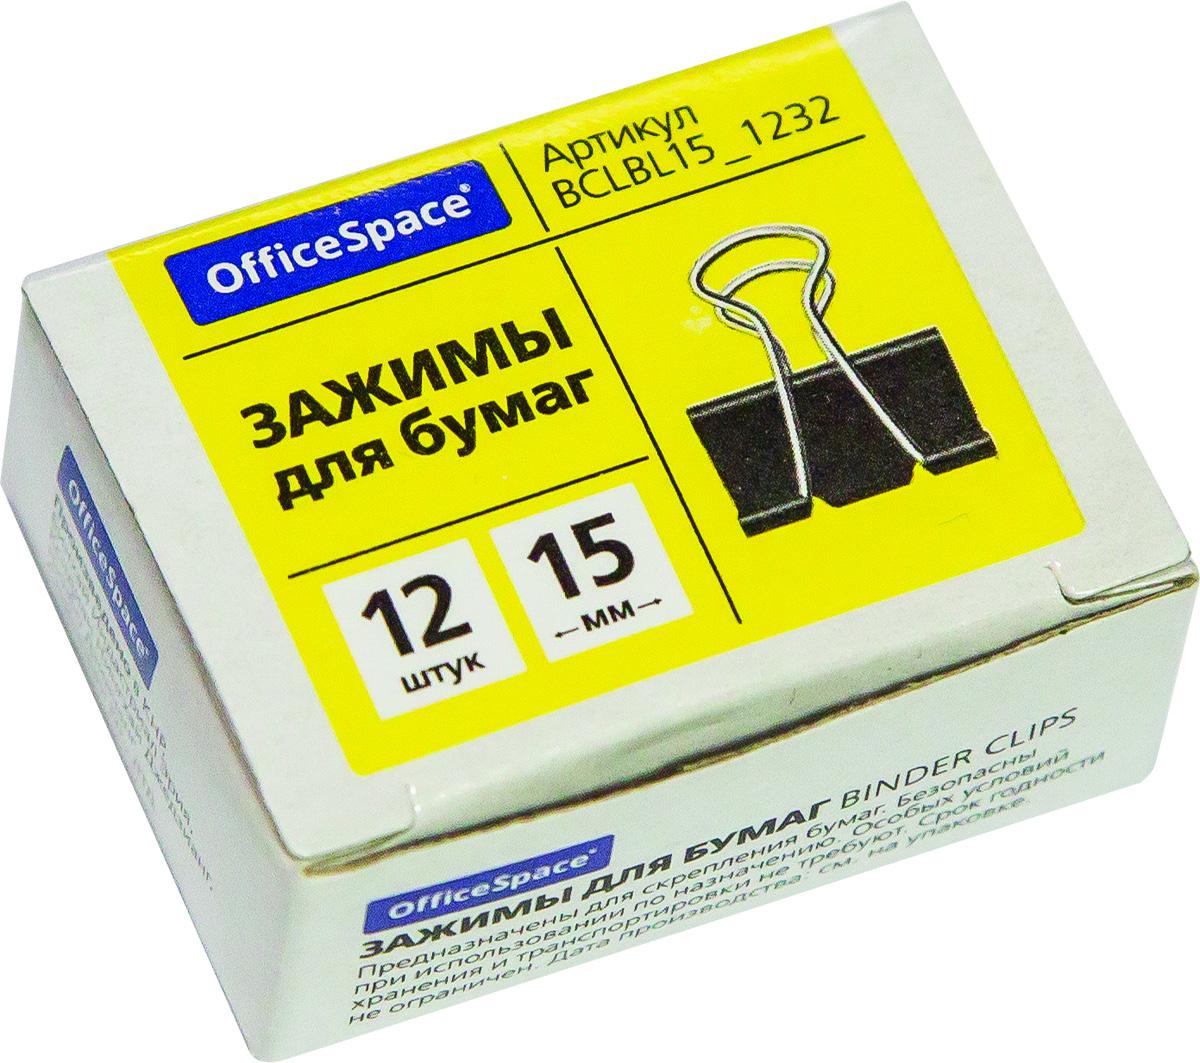 OfficeSpace Зажим для бумаг 15 мм 12 шт BCLBL15_1232